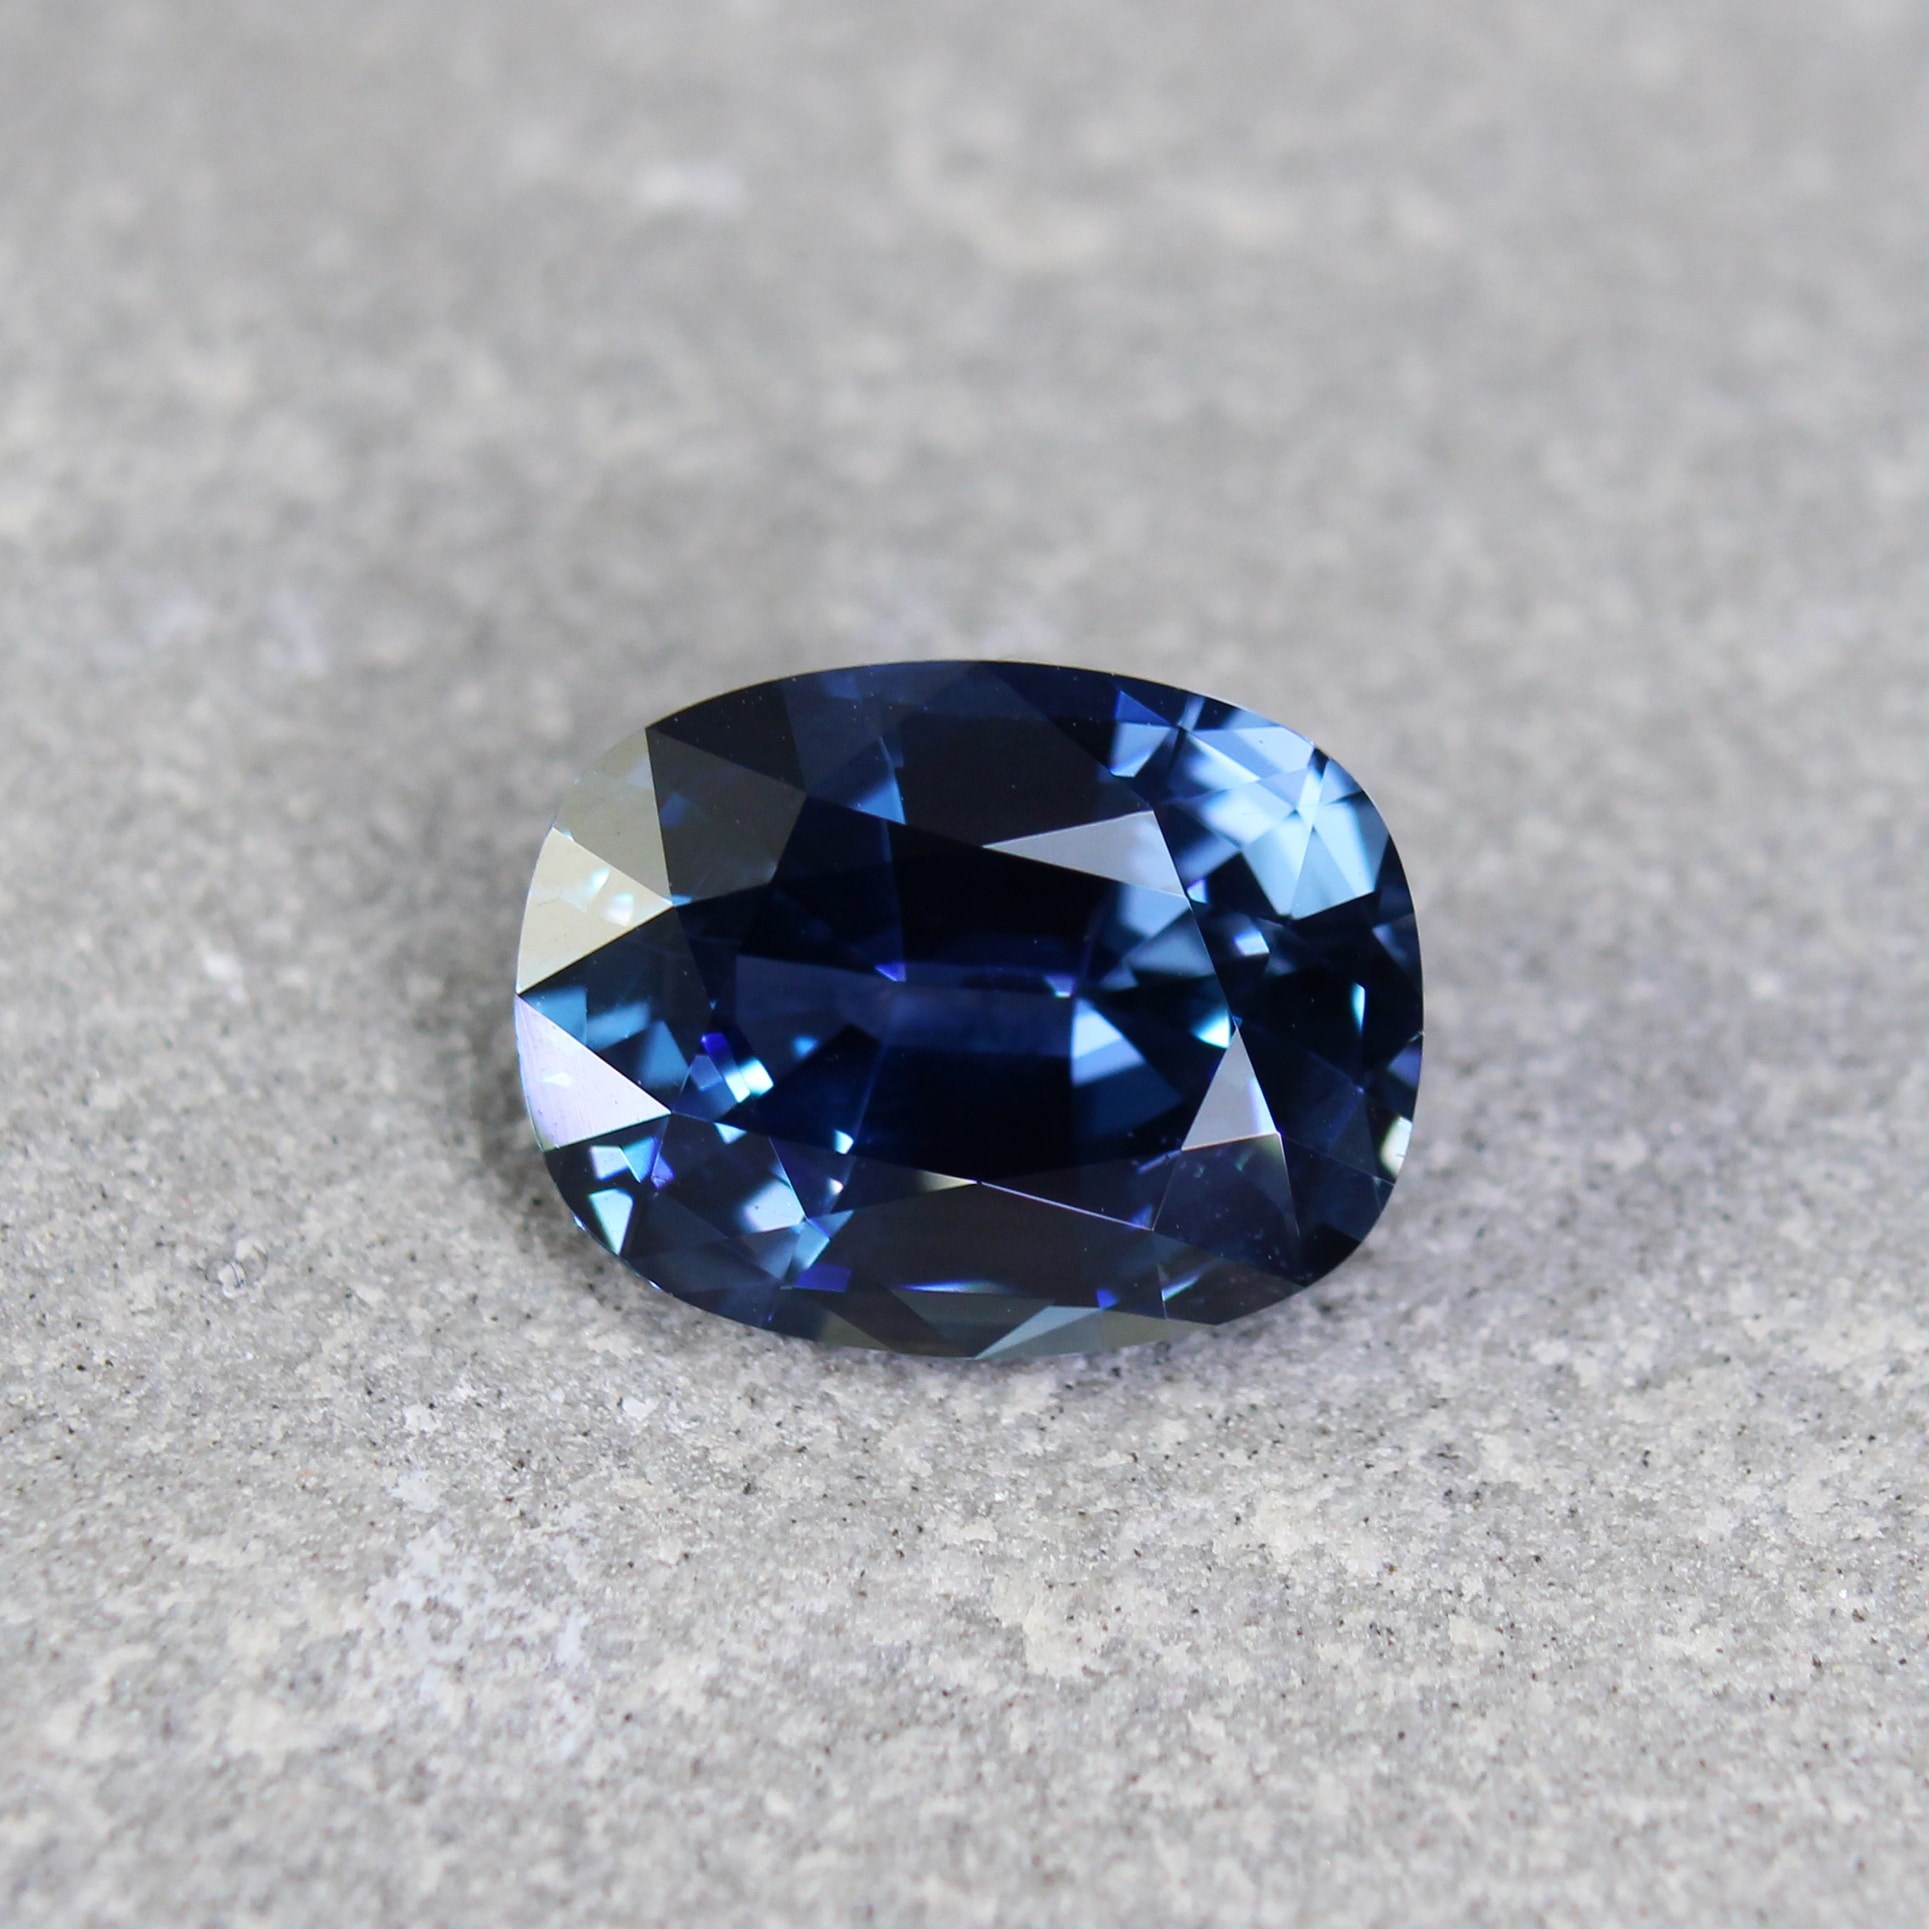 4.39 ct oval blue sapphire